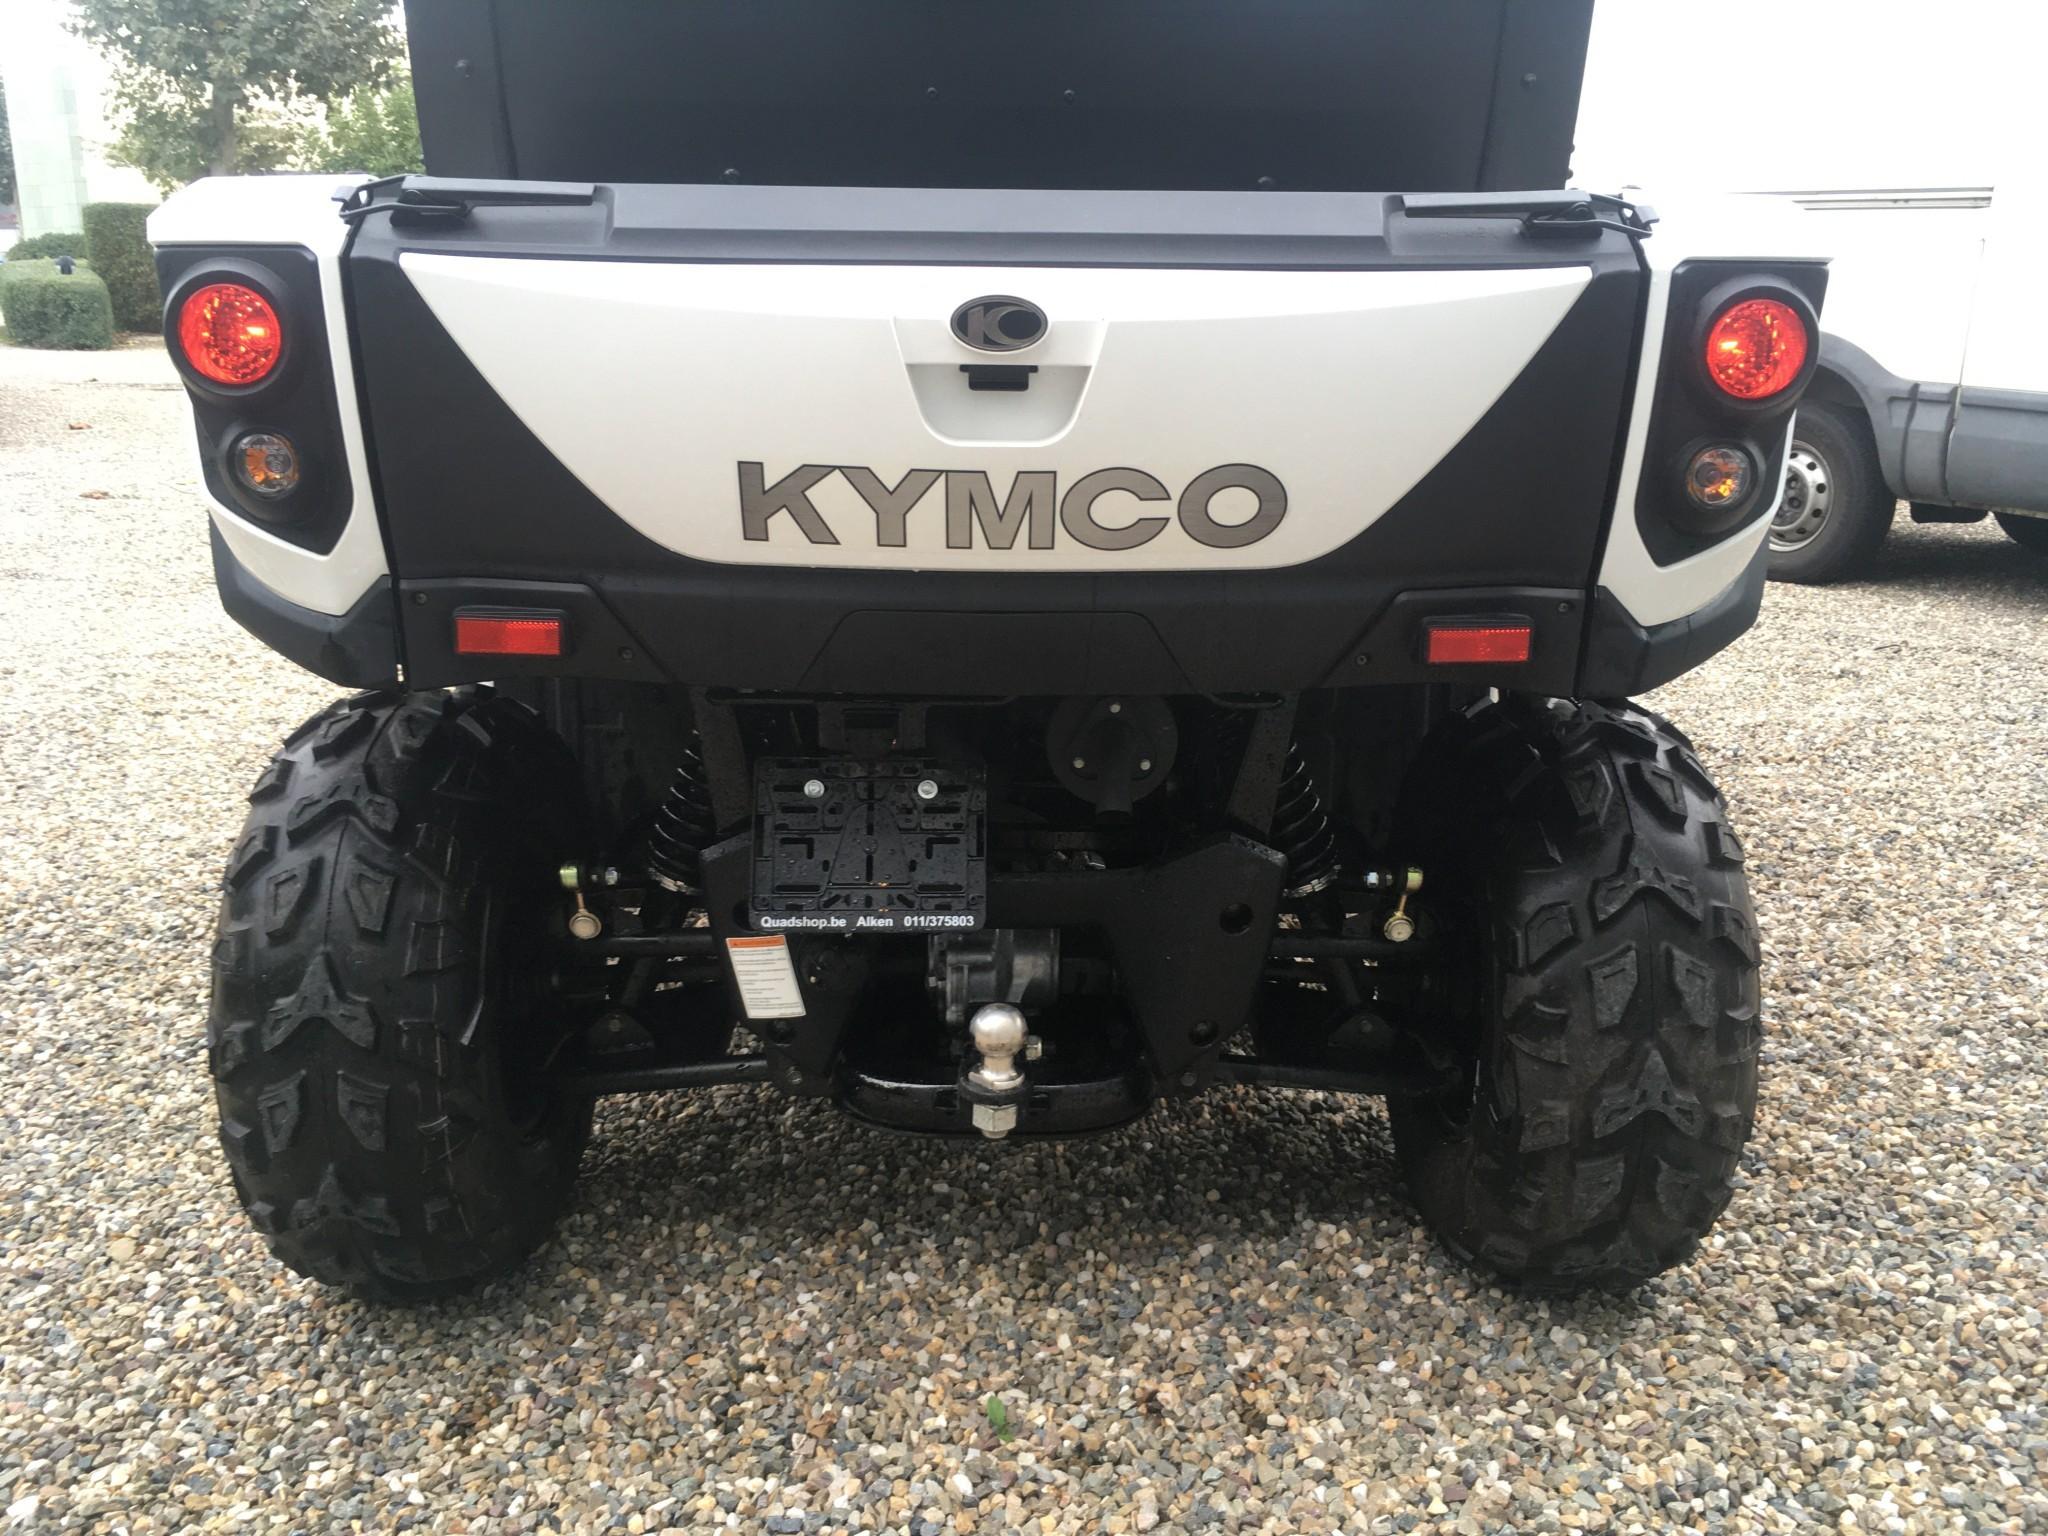 KYMCO UVX450 I